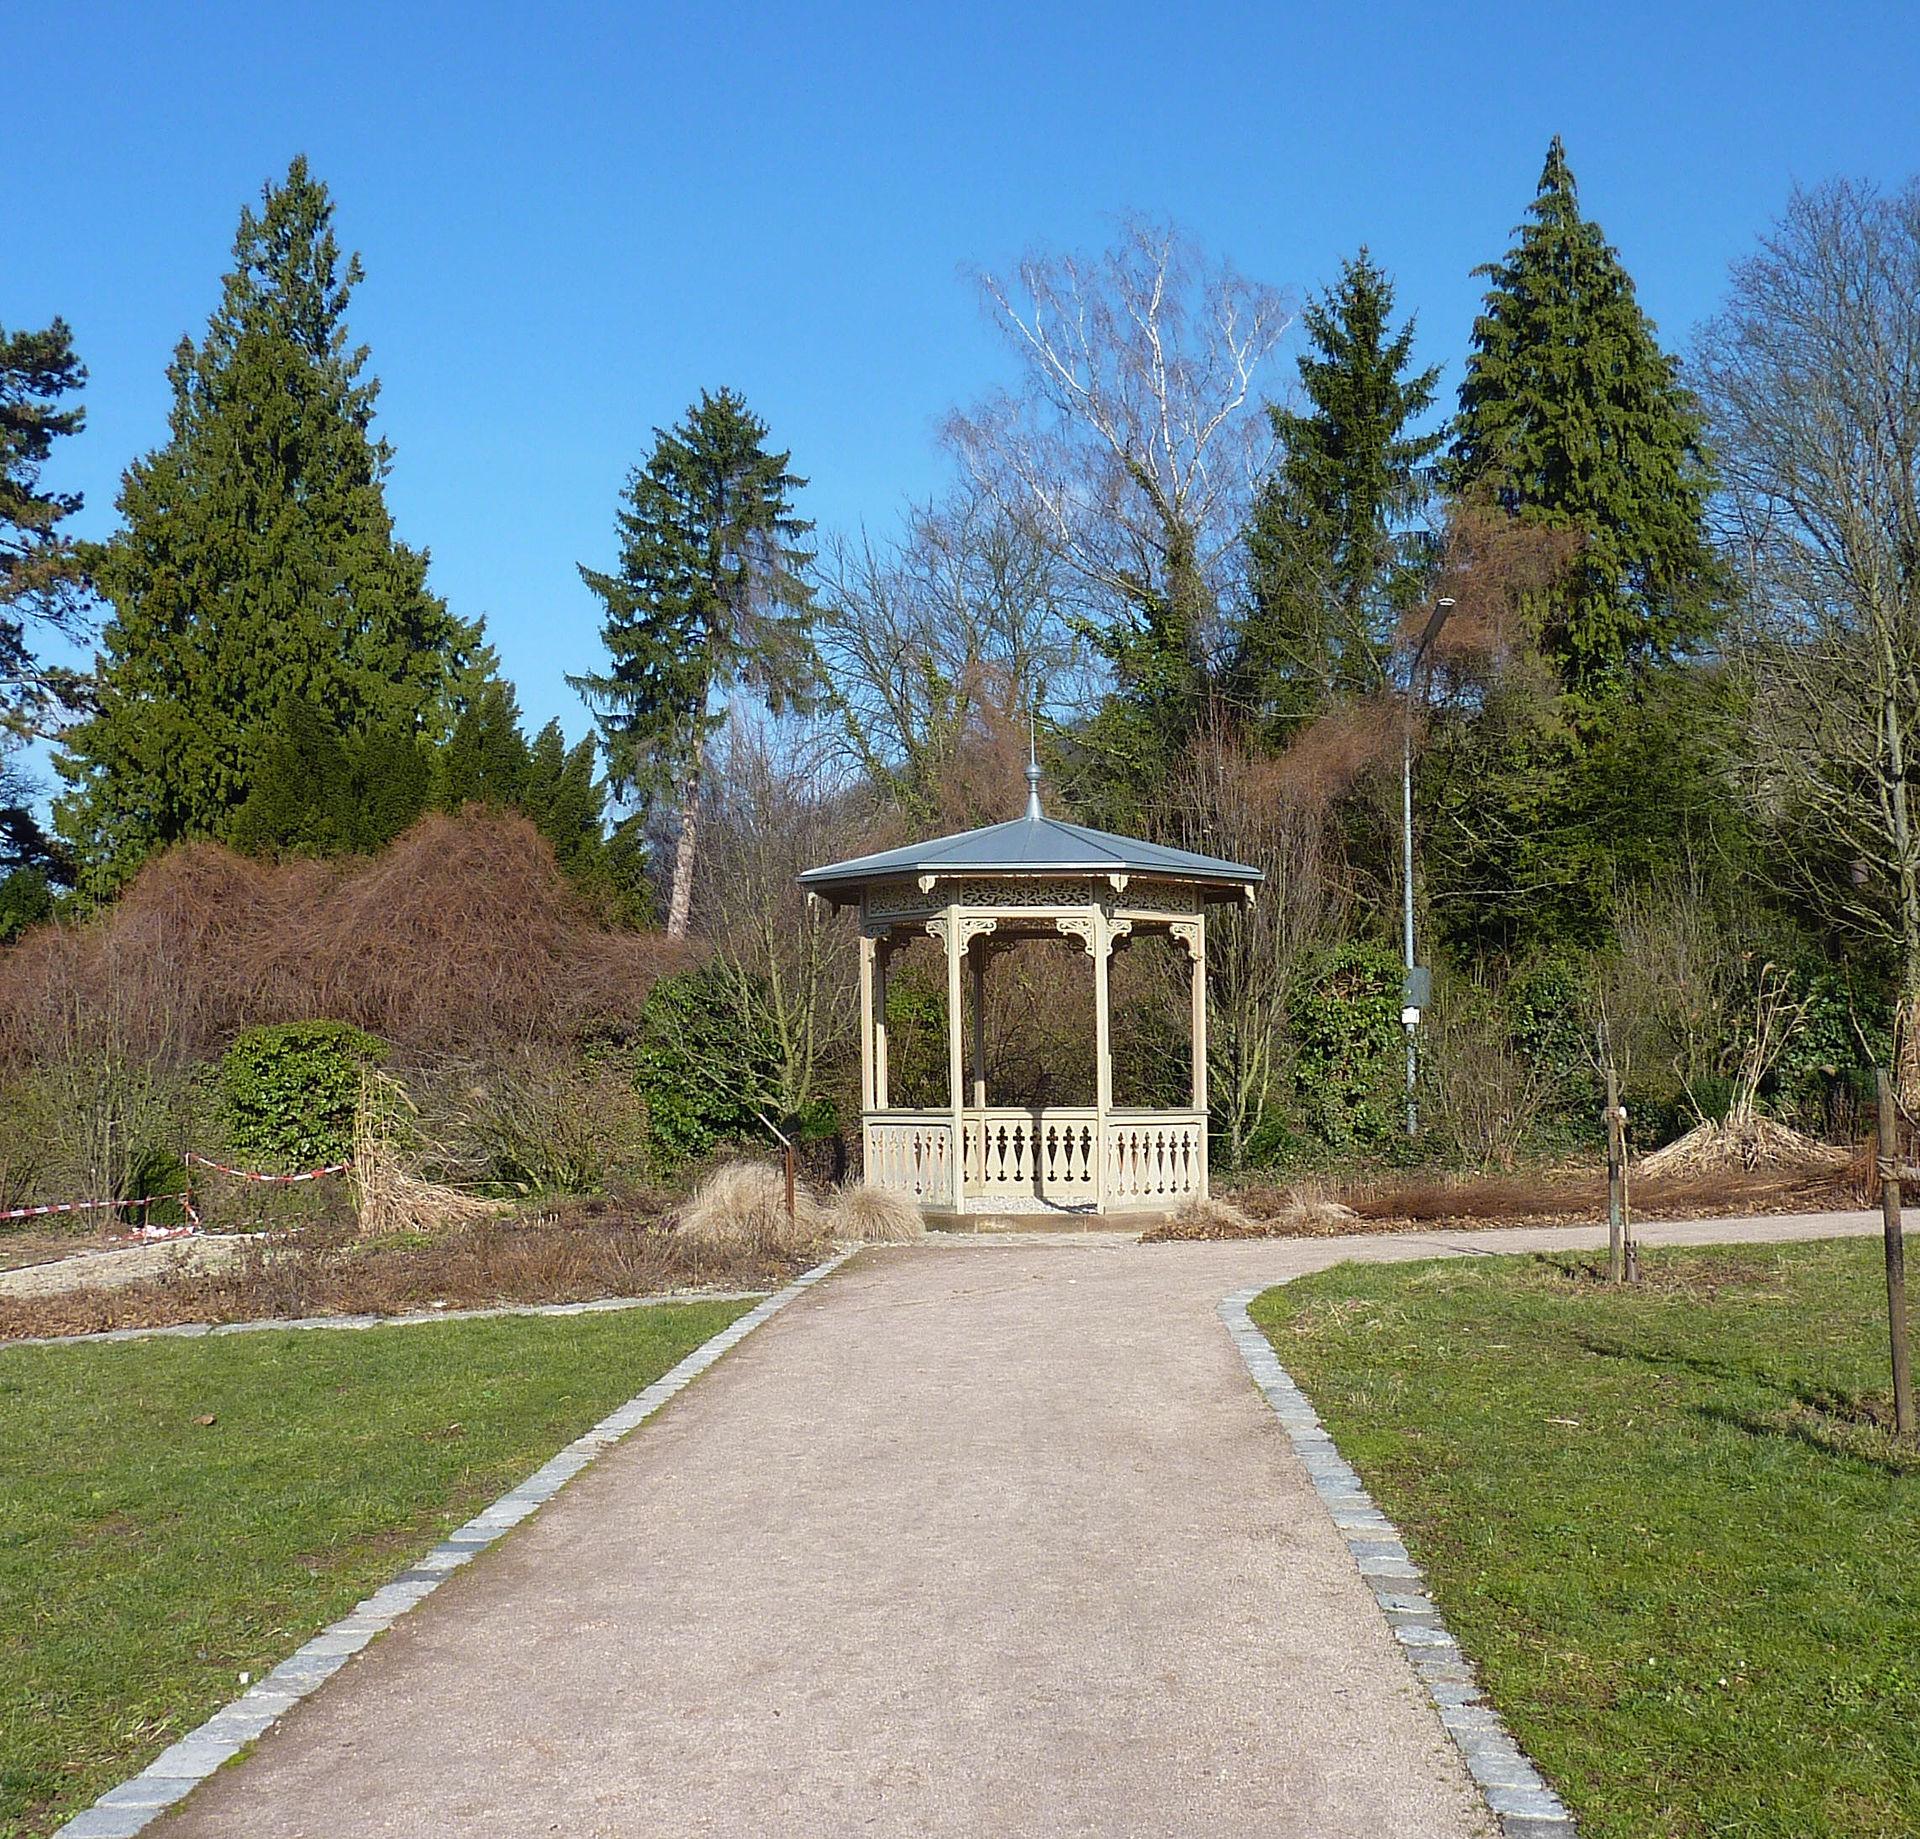 botanischer obstgarten heilbronn wikipedia. Black Bedroom Furniture Sets. Home Design Ideas